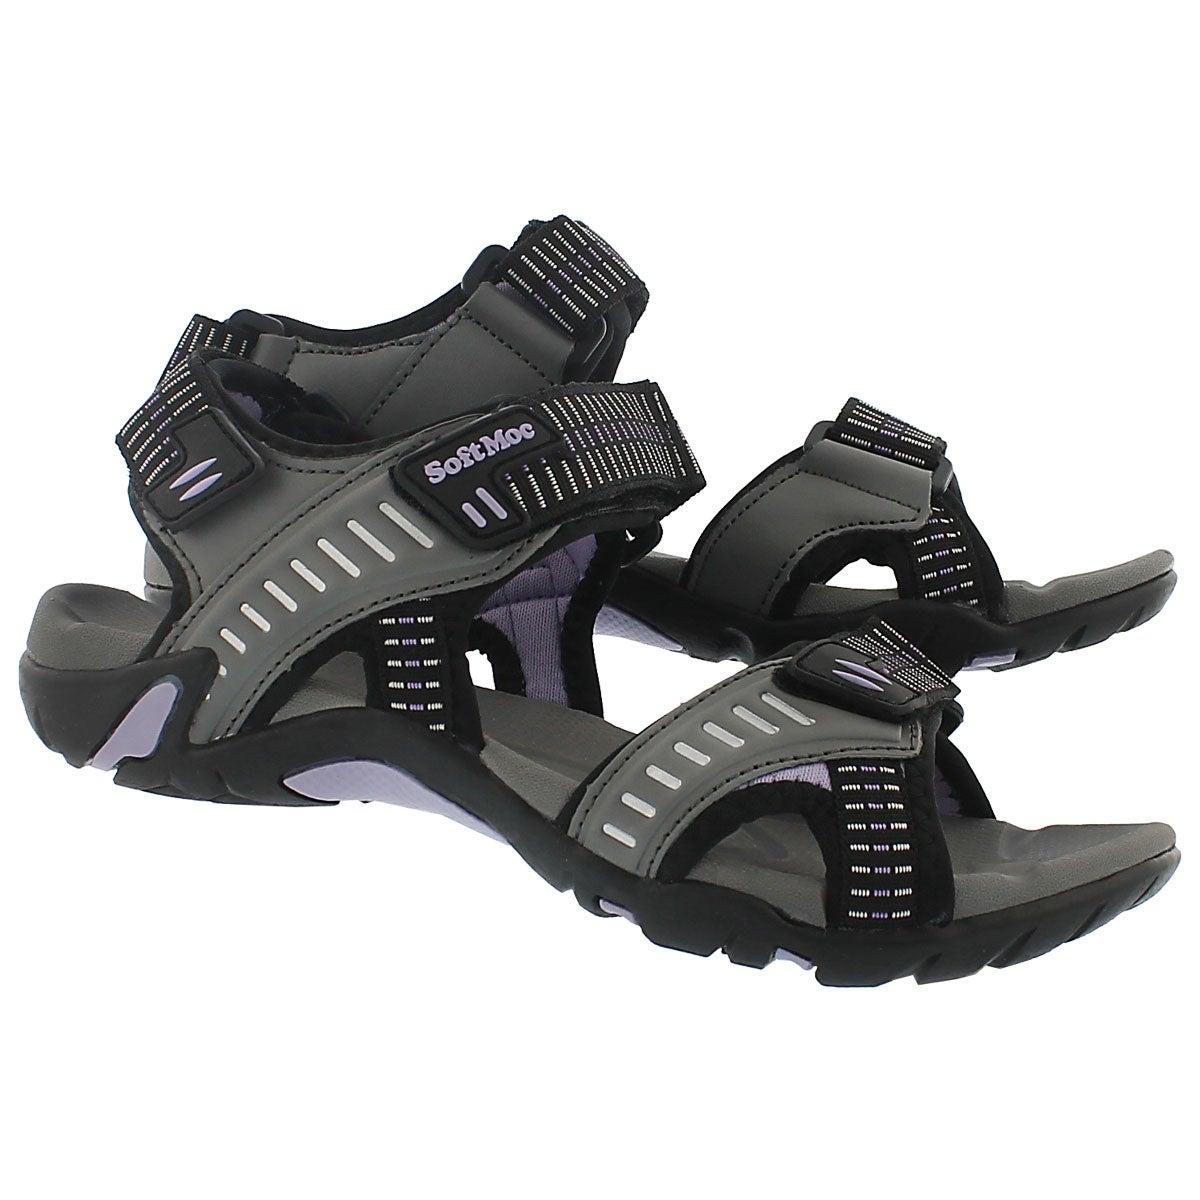 Sandale sport Kara, ardoise, femmes